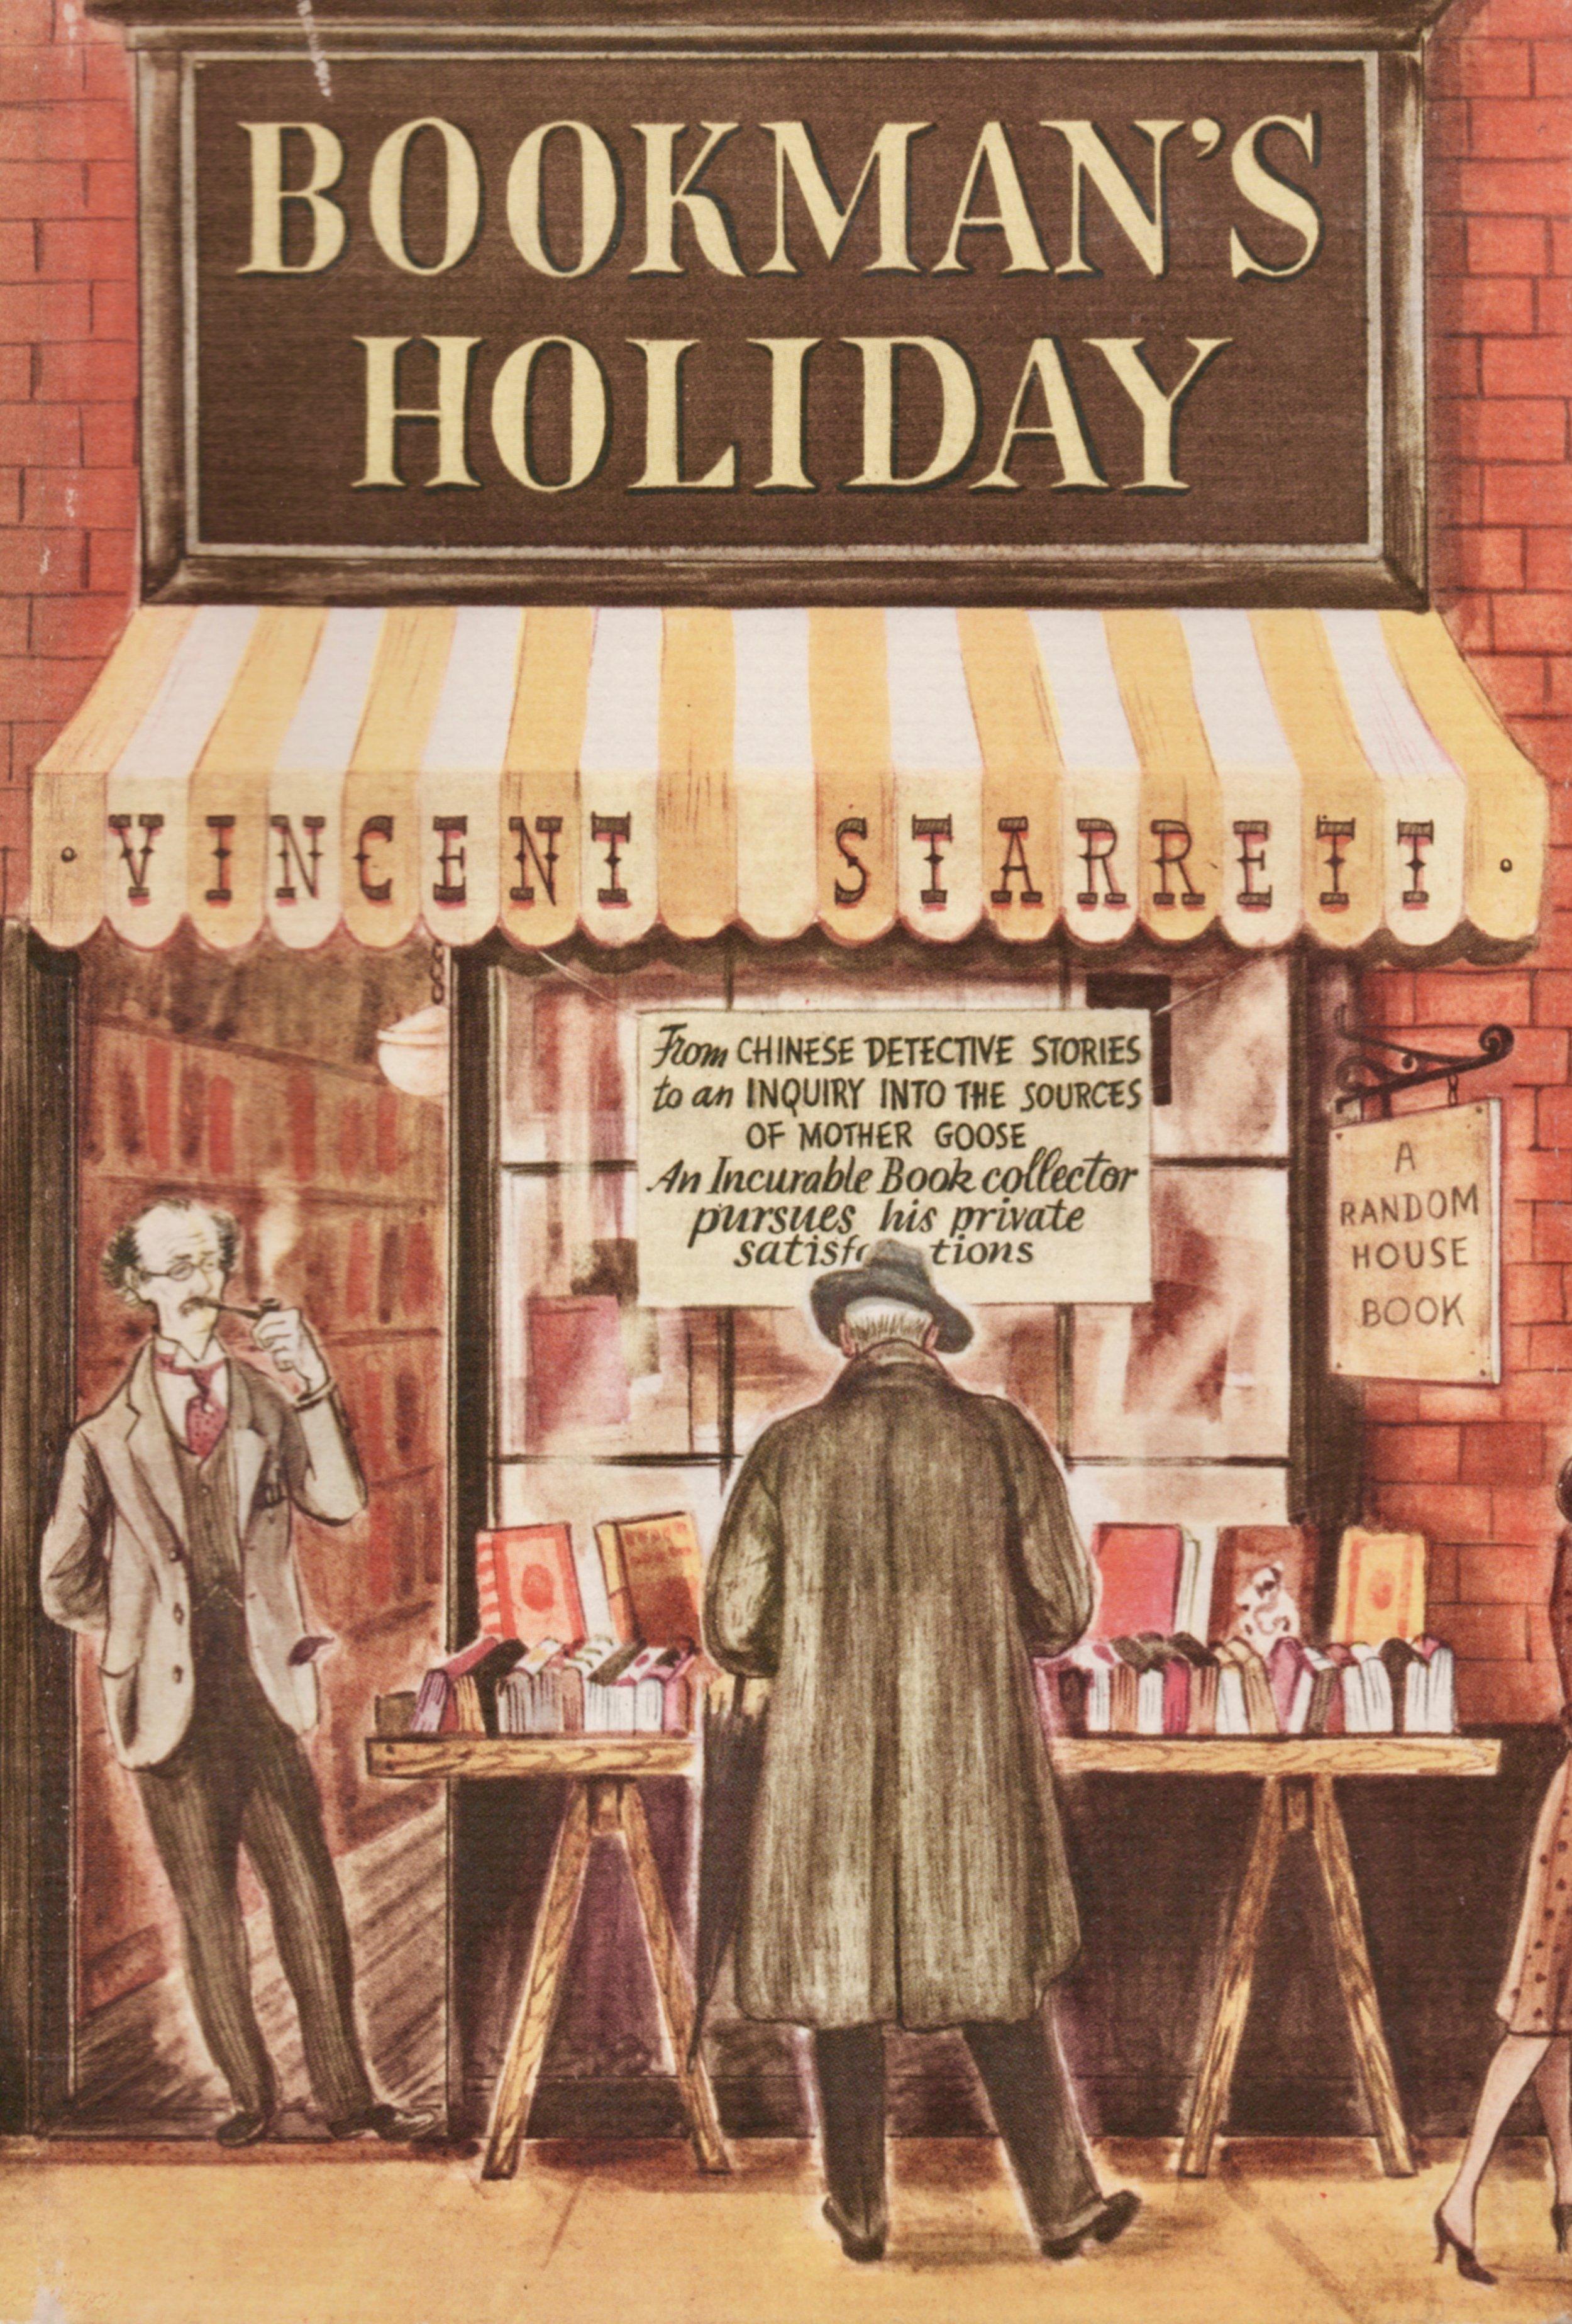 I love Paul Galdone's dust jackets for Random House.